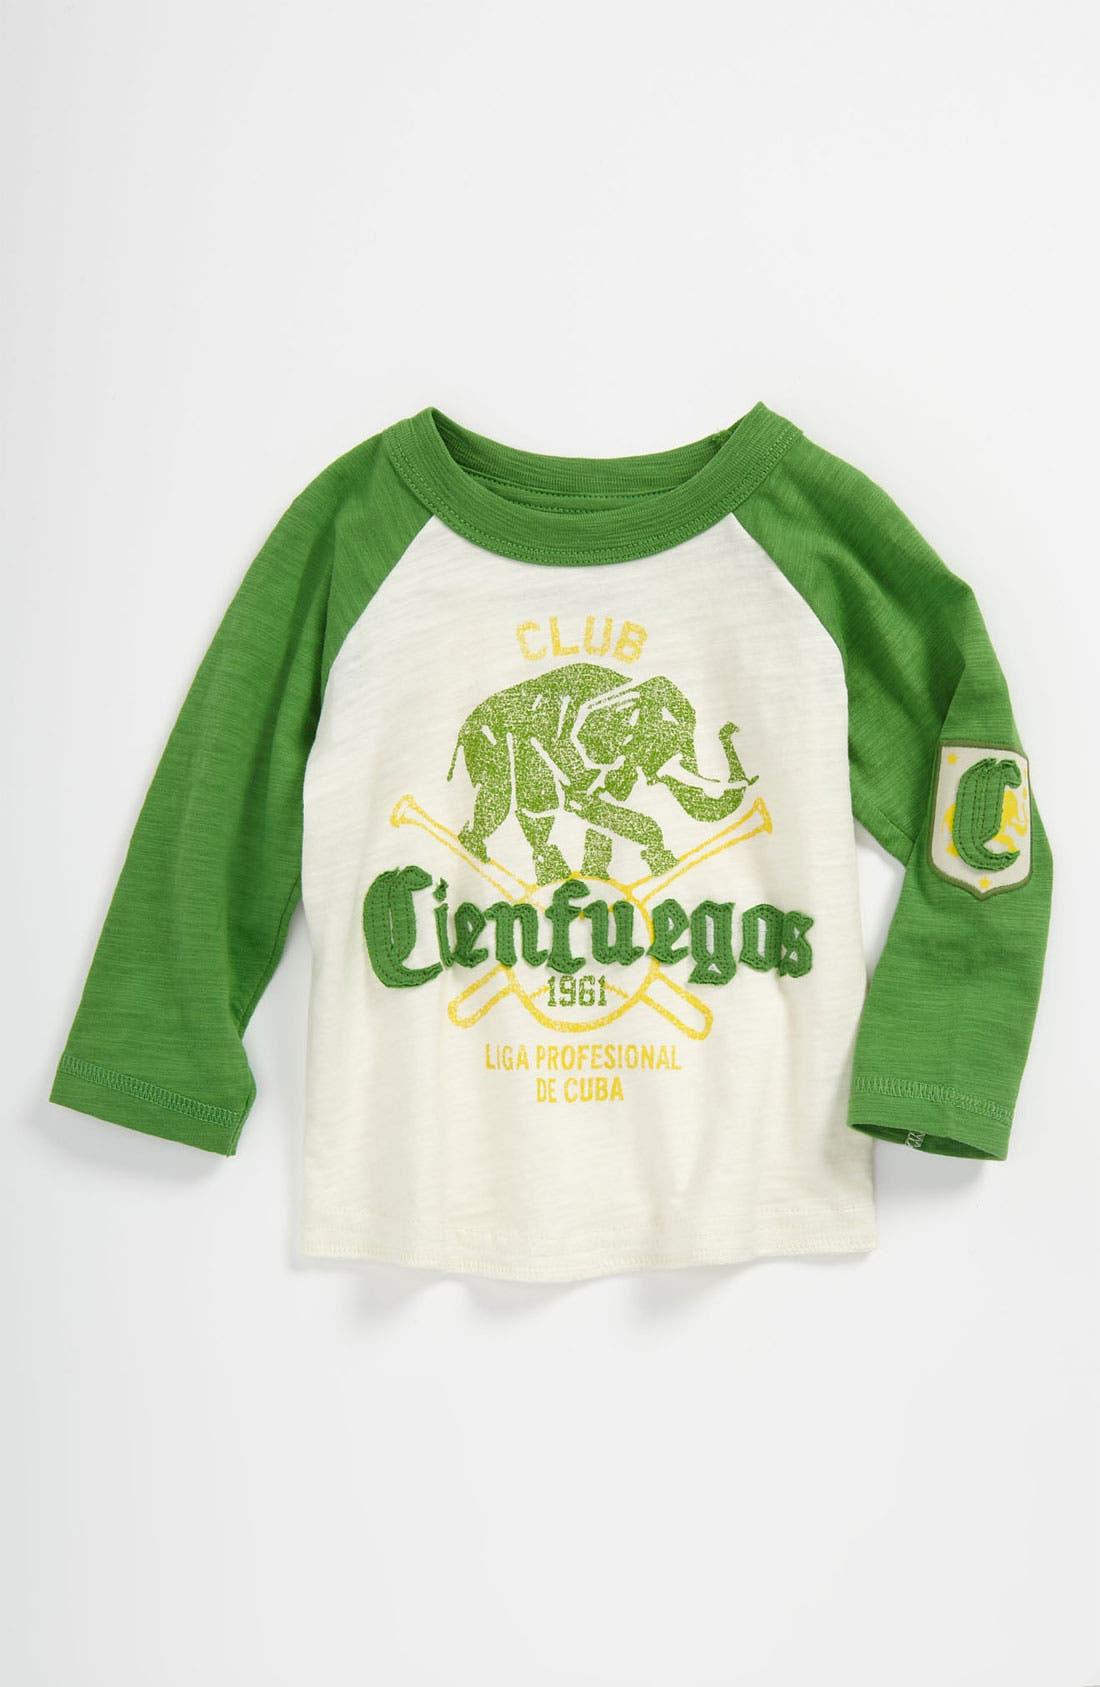 Alternate Image 1 Selected - Peek 'Club Cienfuegos' Baseball Jersey T-Shirt (Baby)